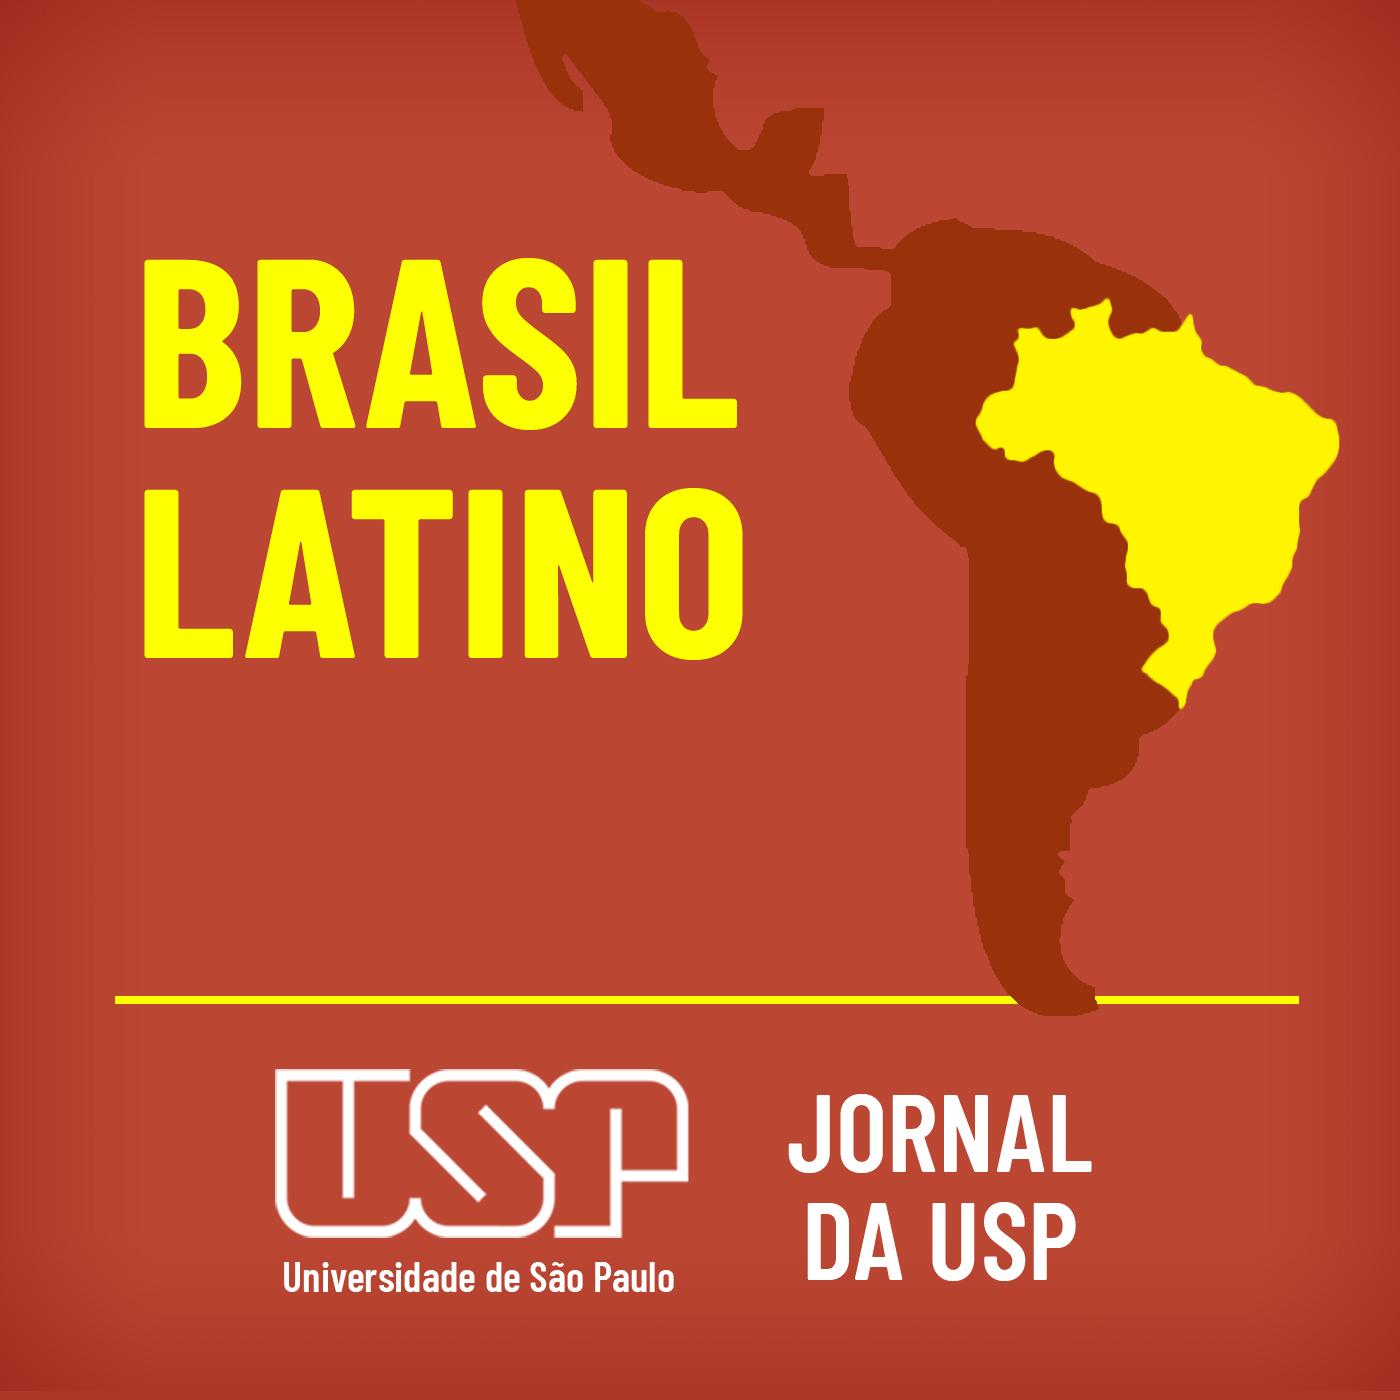 Brasil Latino – Francisco Brito Cruz e o problema das fake news na democracia